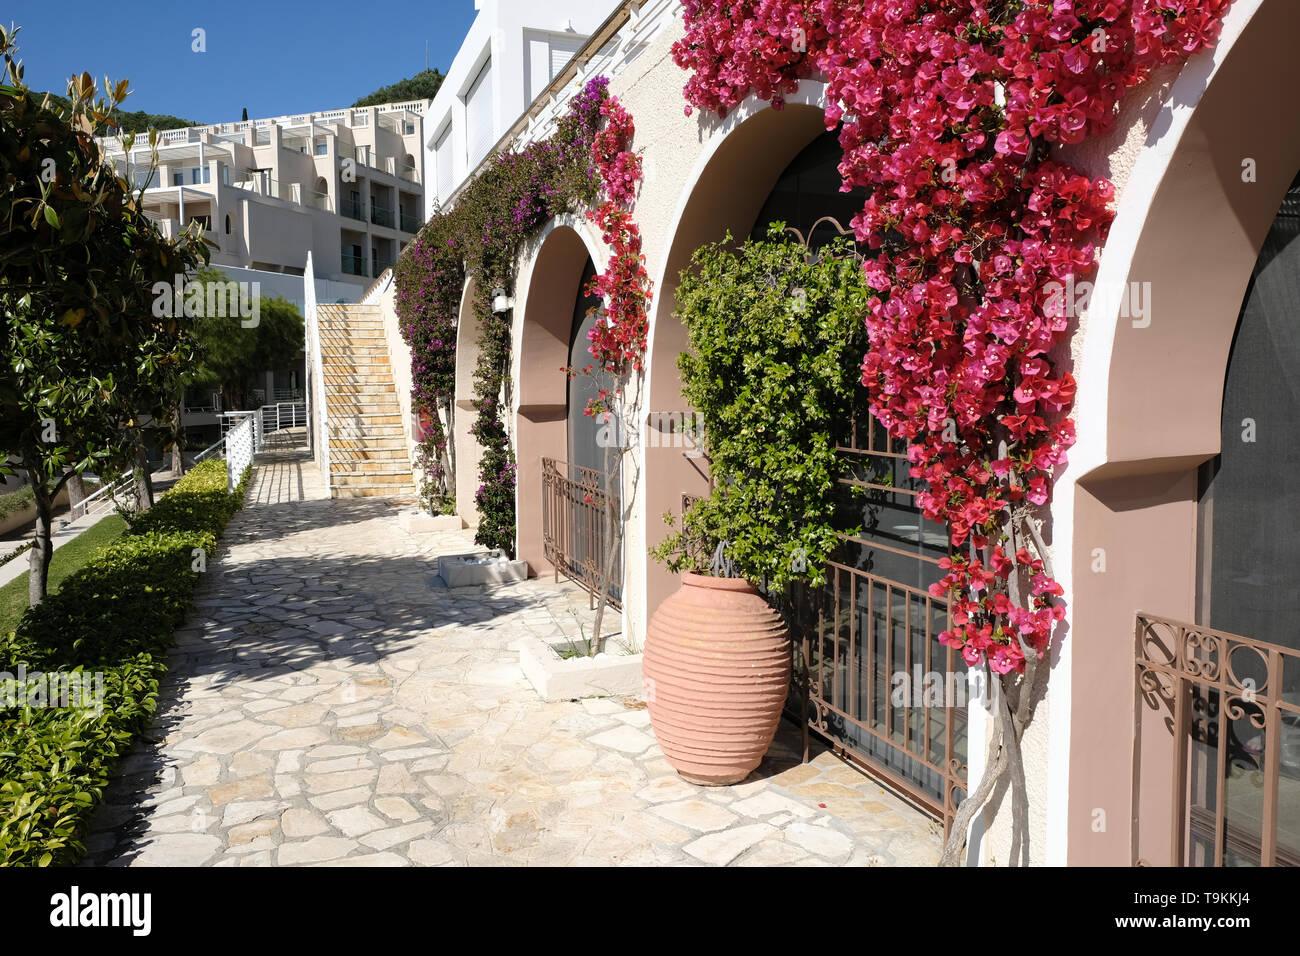 Bushes of thorny ornamental vines, bouganvillea, decorate a wall in Corfu, Greece - Stock Image